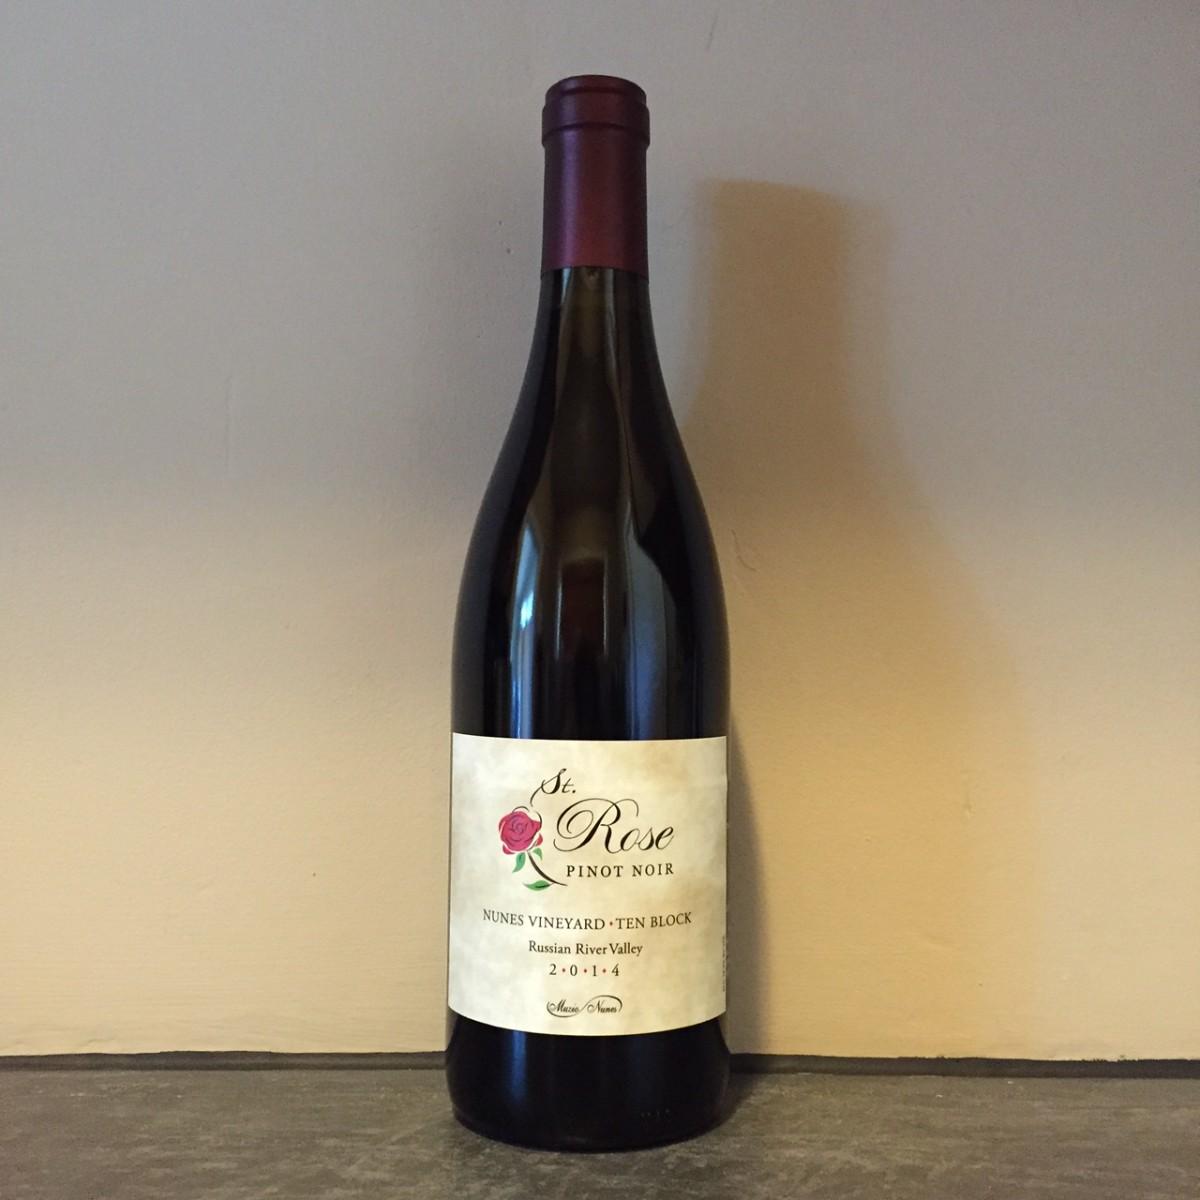 Saint Rose 2014 Ten Block Russian River Pinot Noir